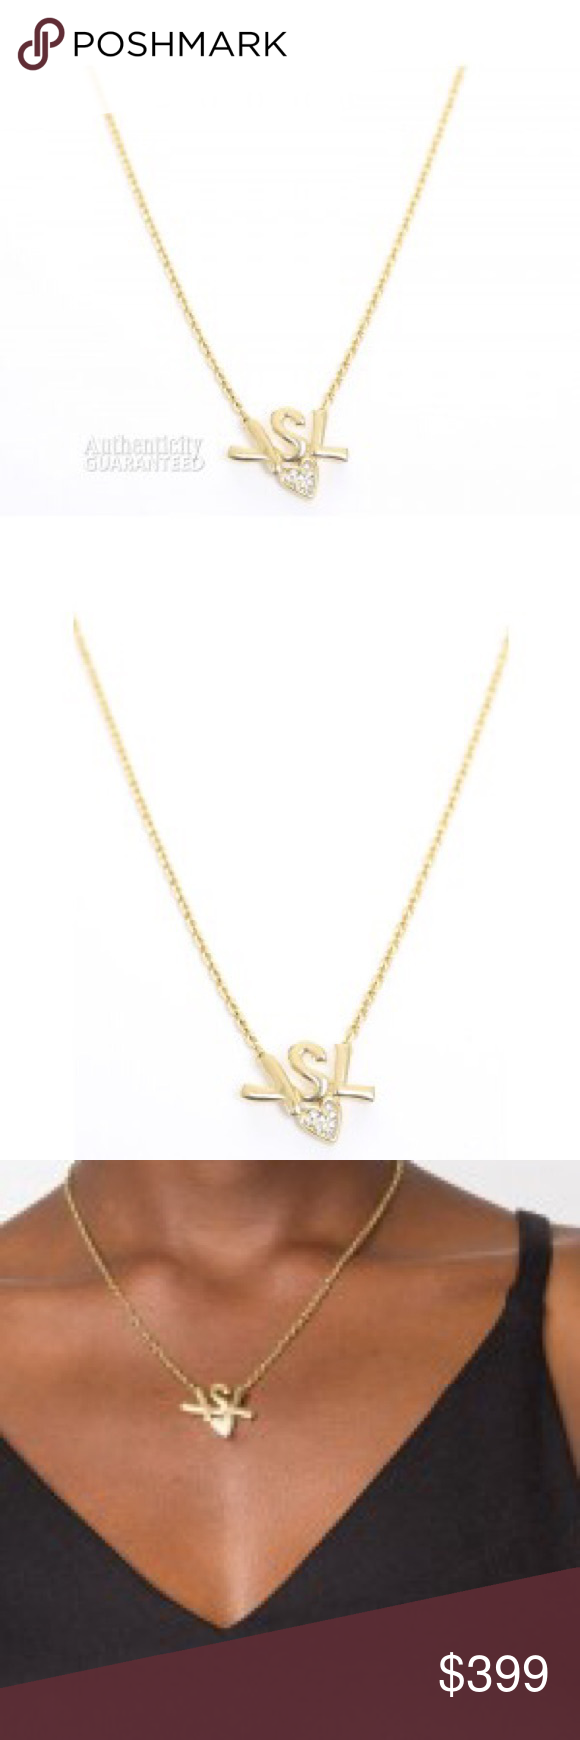 9b76396b5d4 Yves Saint Laurent Gold Logo Heart Necklace YSL Pendant Logo, Rhinestone  Heart Detail, Spring Clasp Closure, Gold Tone Hardware Yves Saint Laurent  Jewelry ...